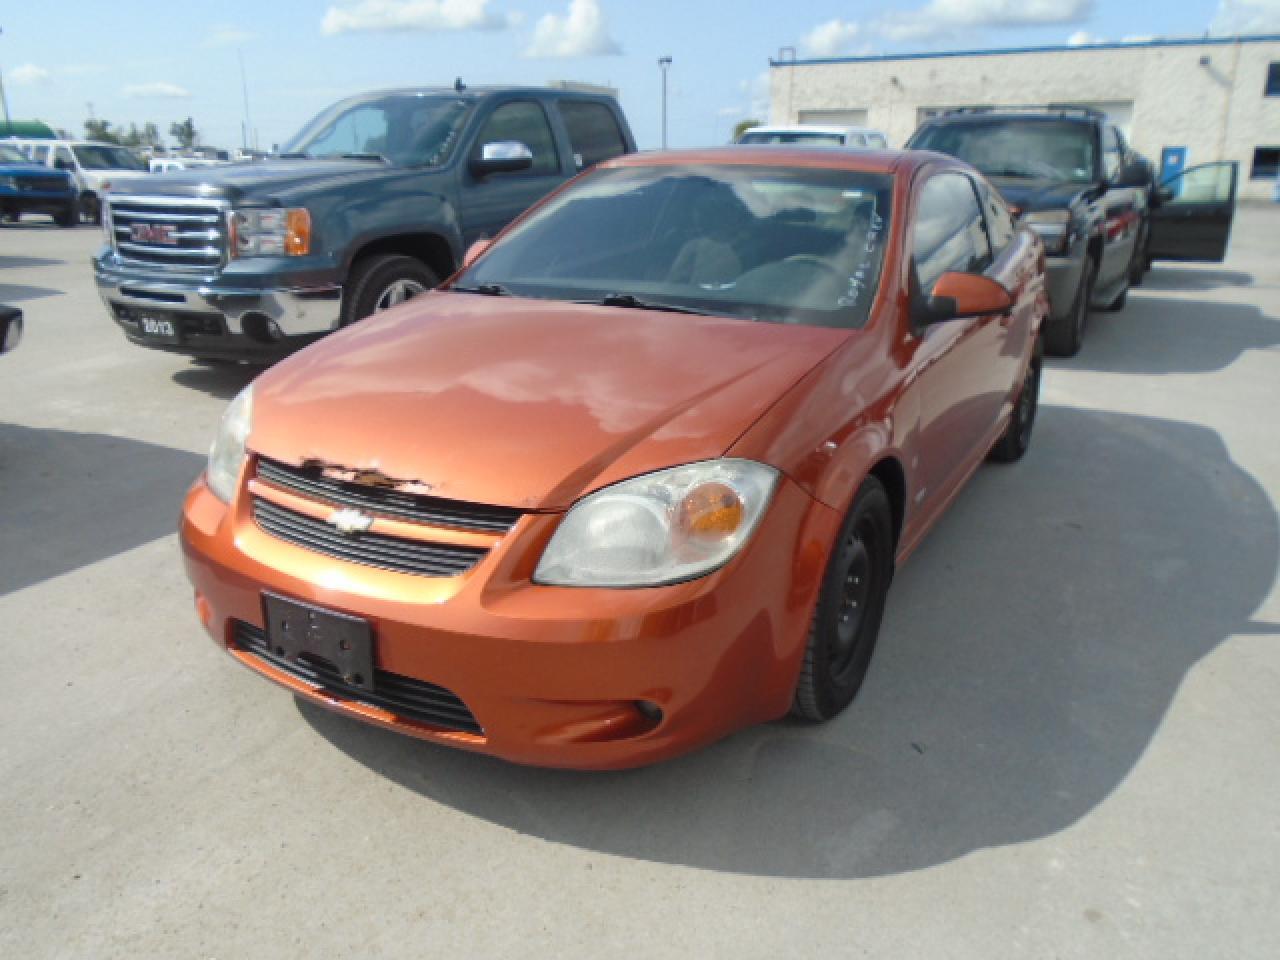 Photo of Orange 2006 Chevrolet Cobalt